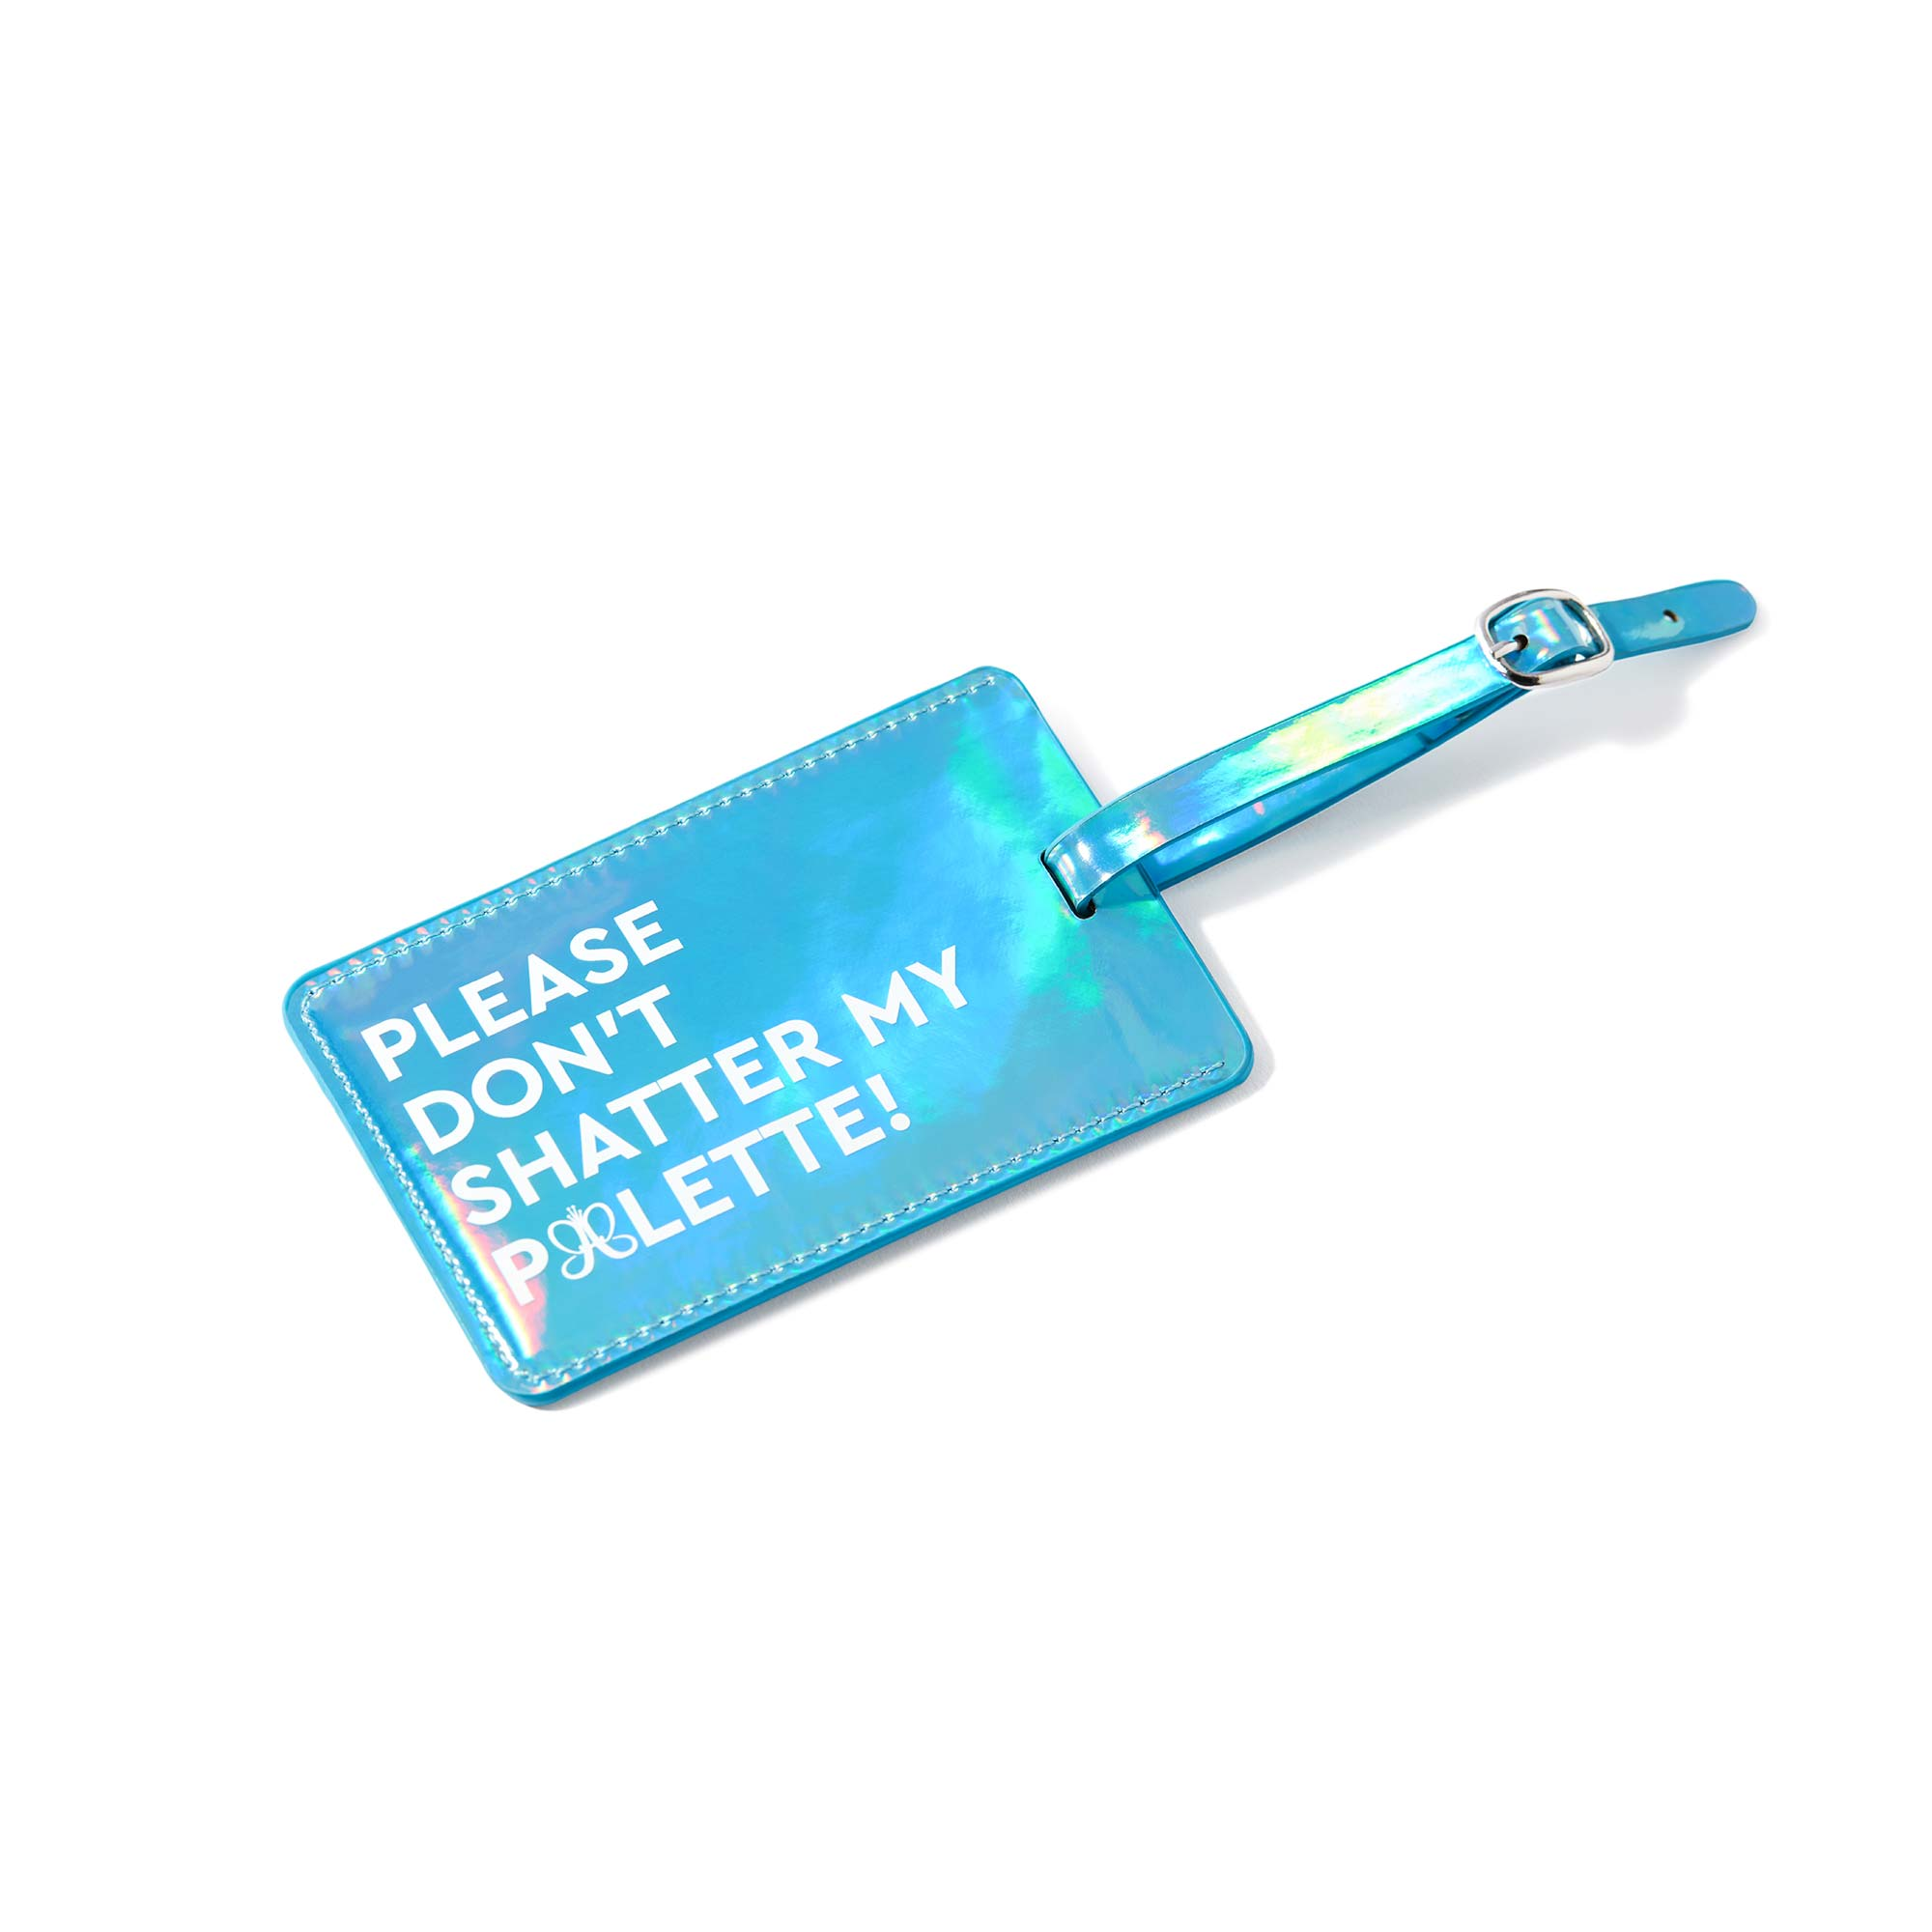 ABH Luggage Tag - Metallic Aqua Blue